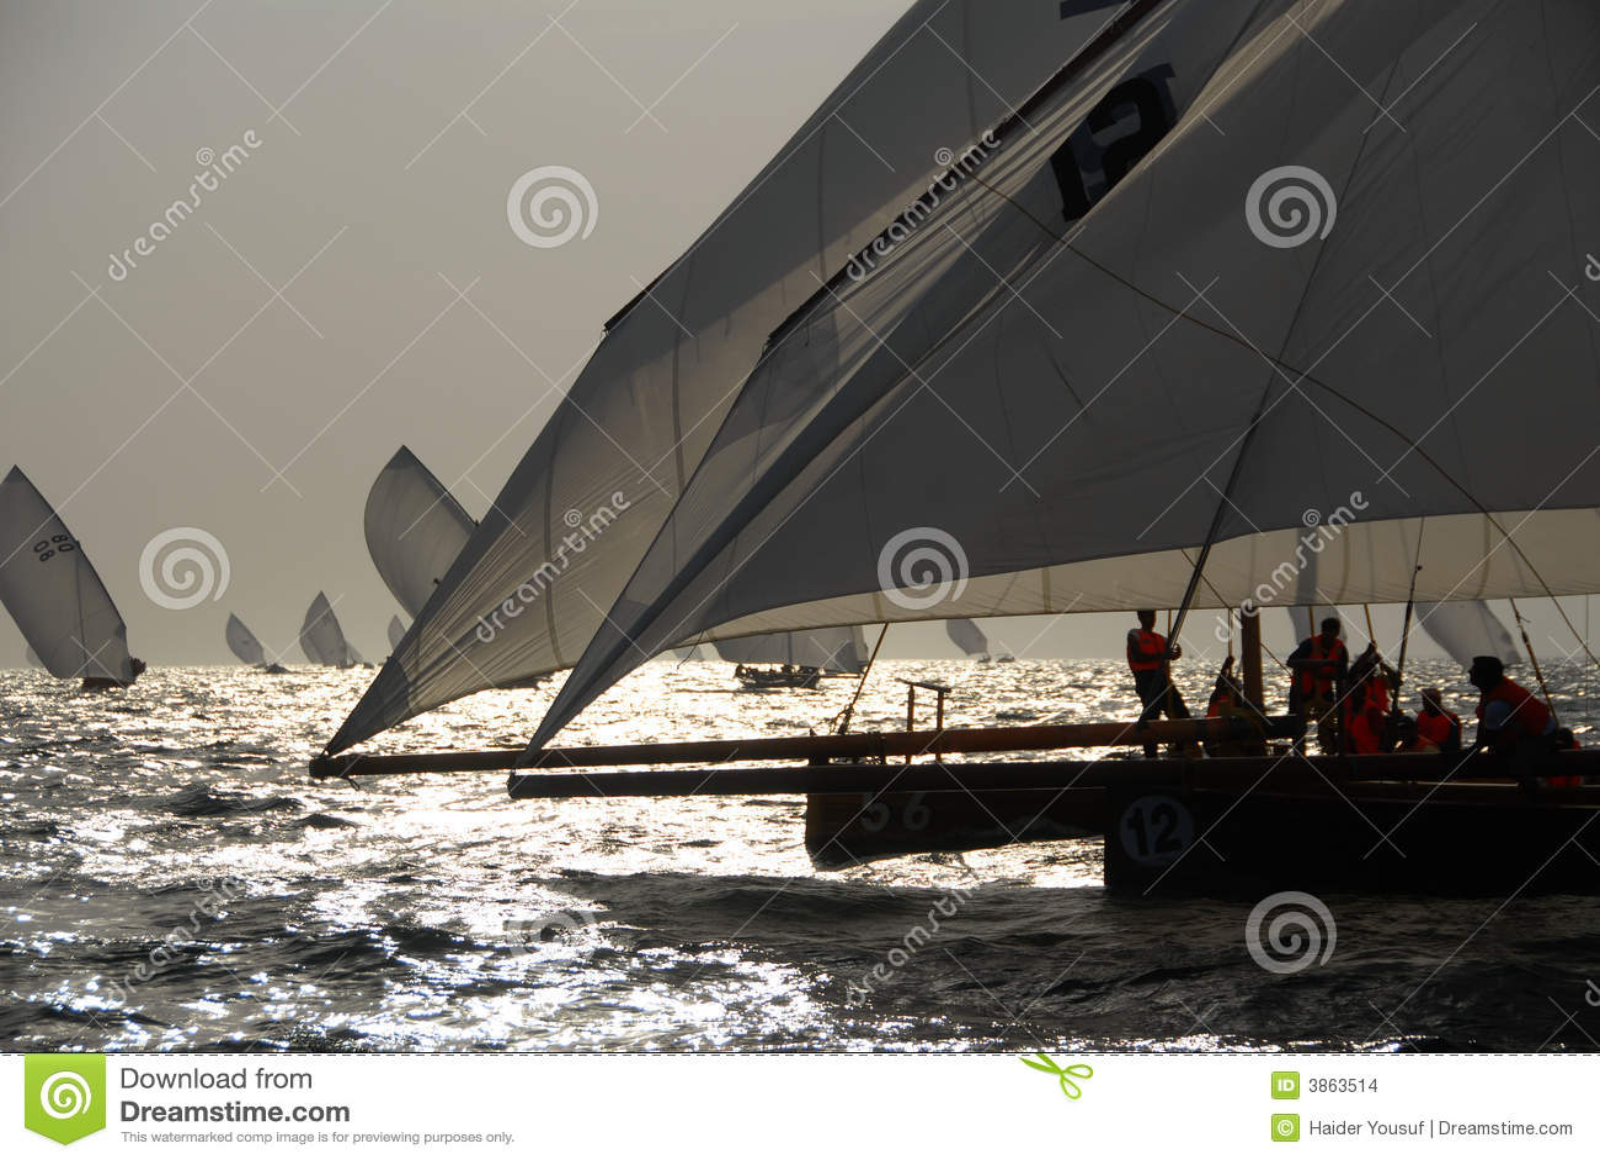 Segel zum zu segeln